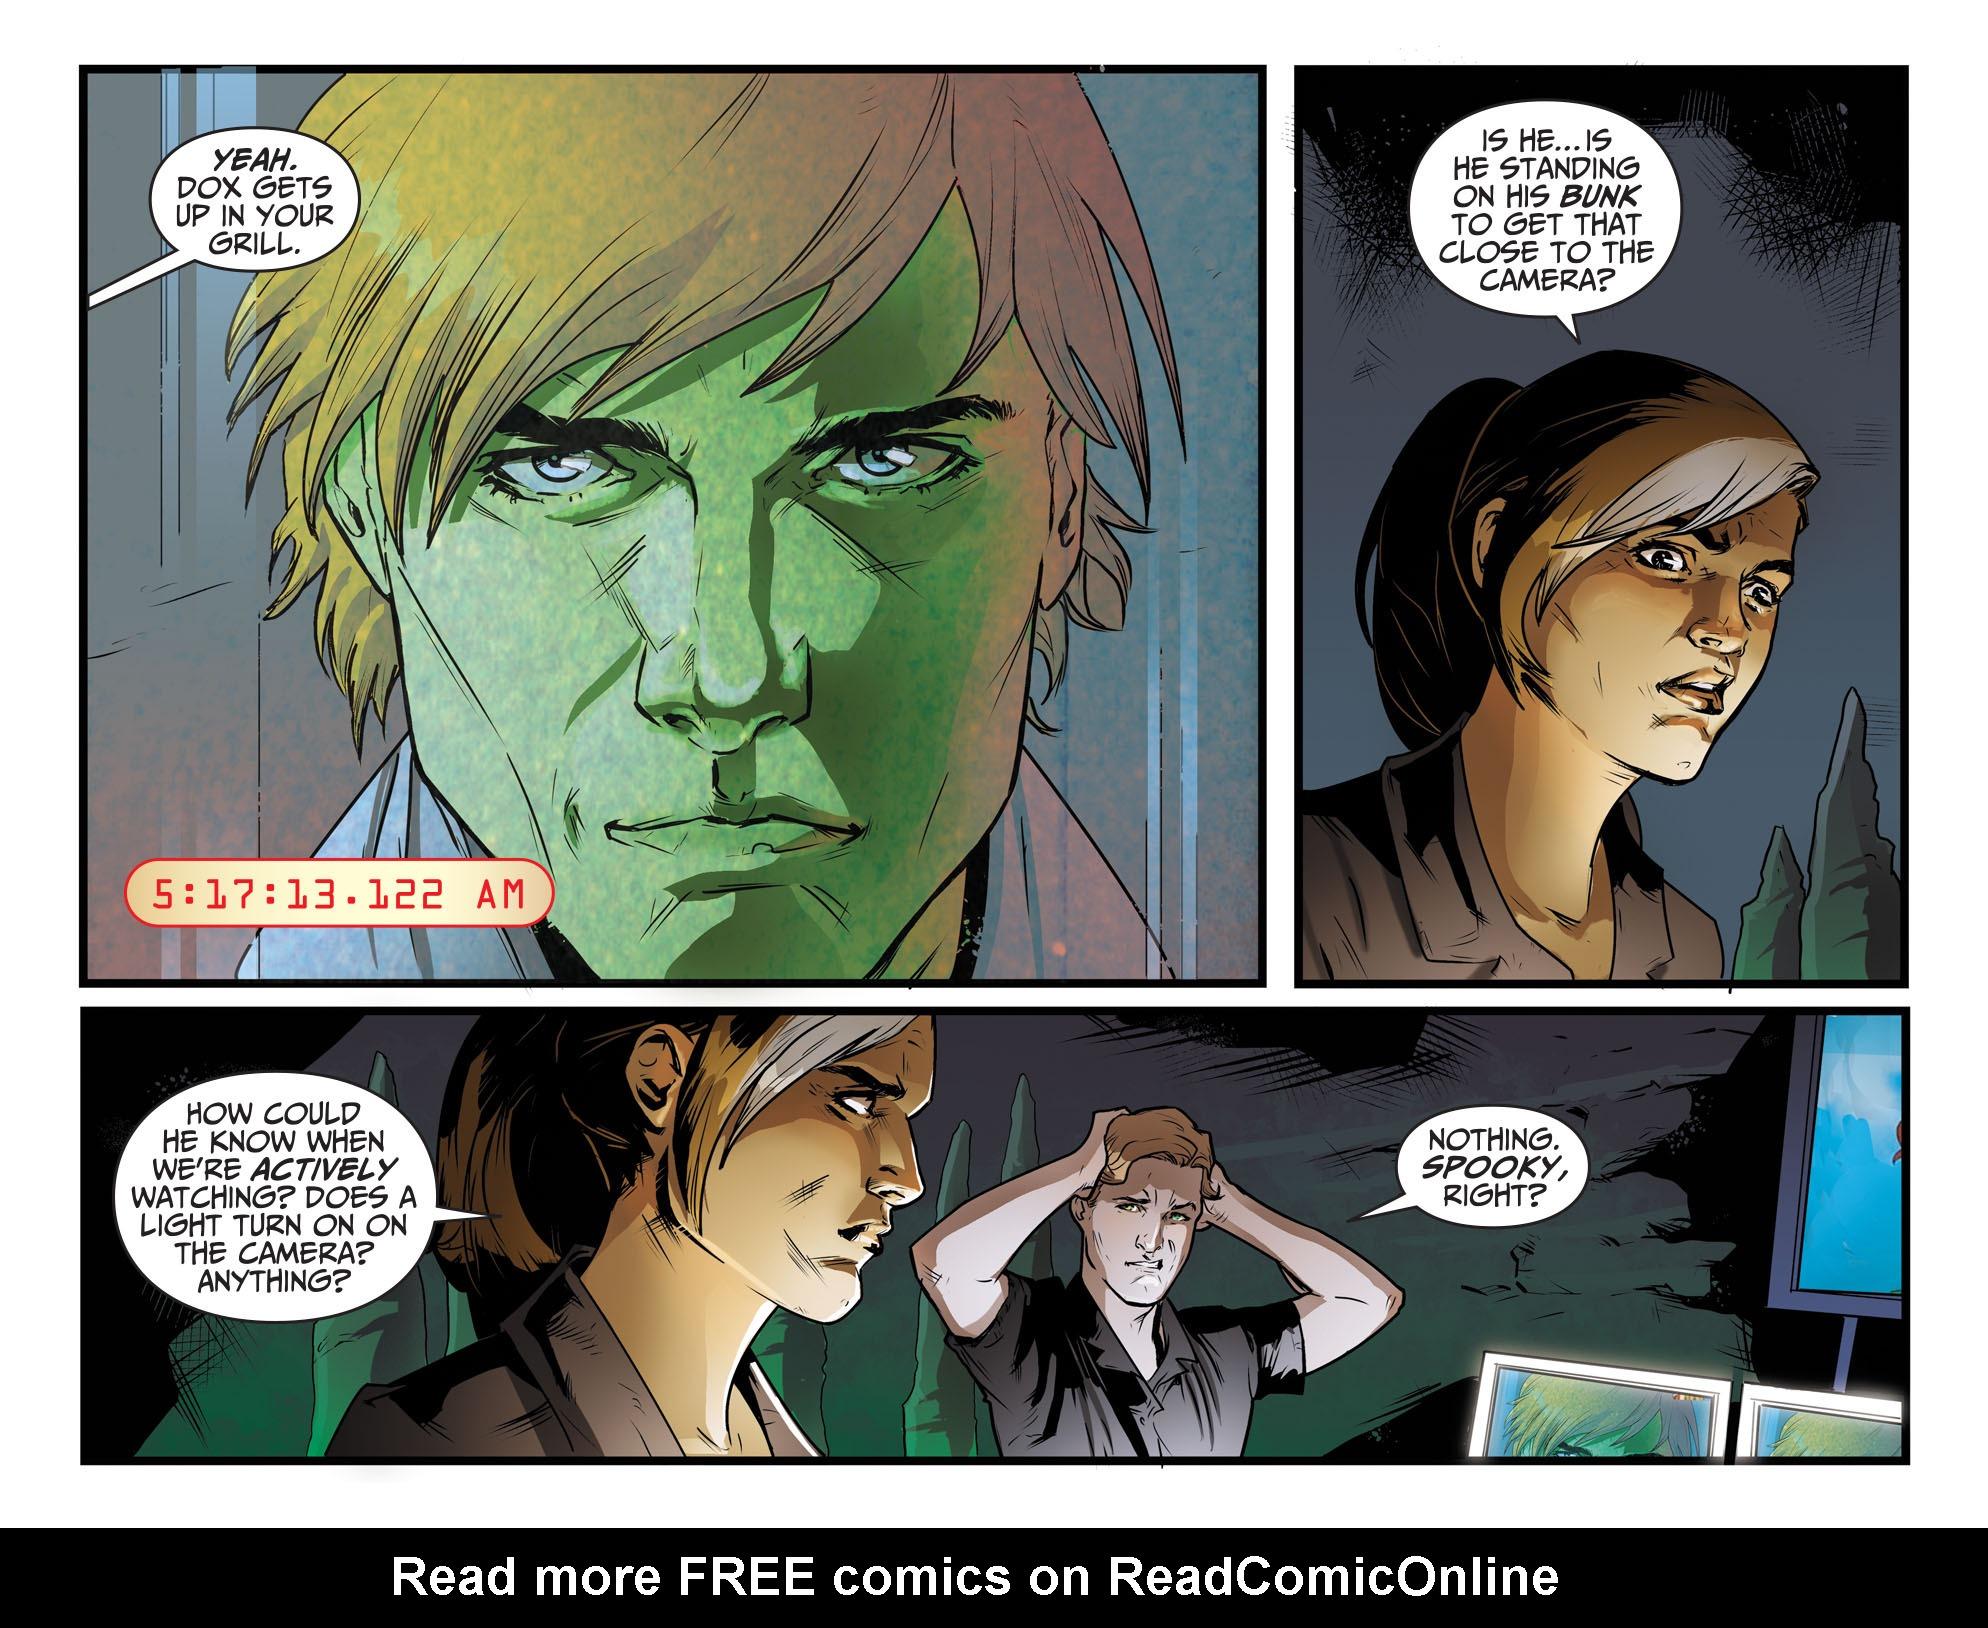 Read online Adventures of Supergirl comic -  Issue #8 - 5